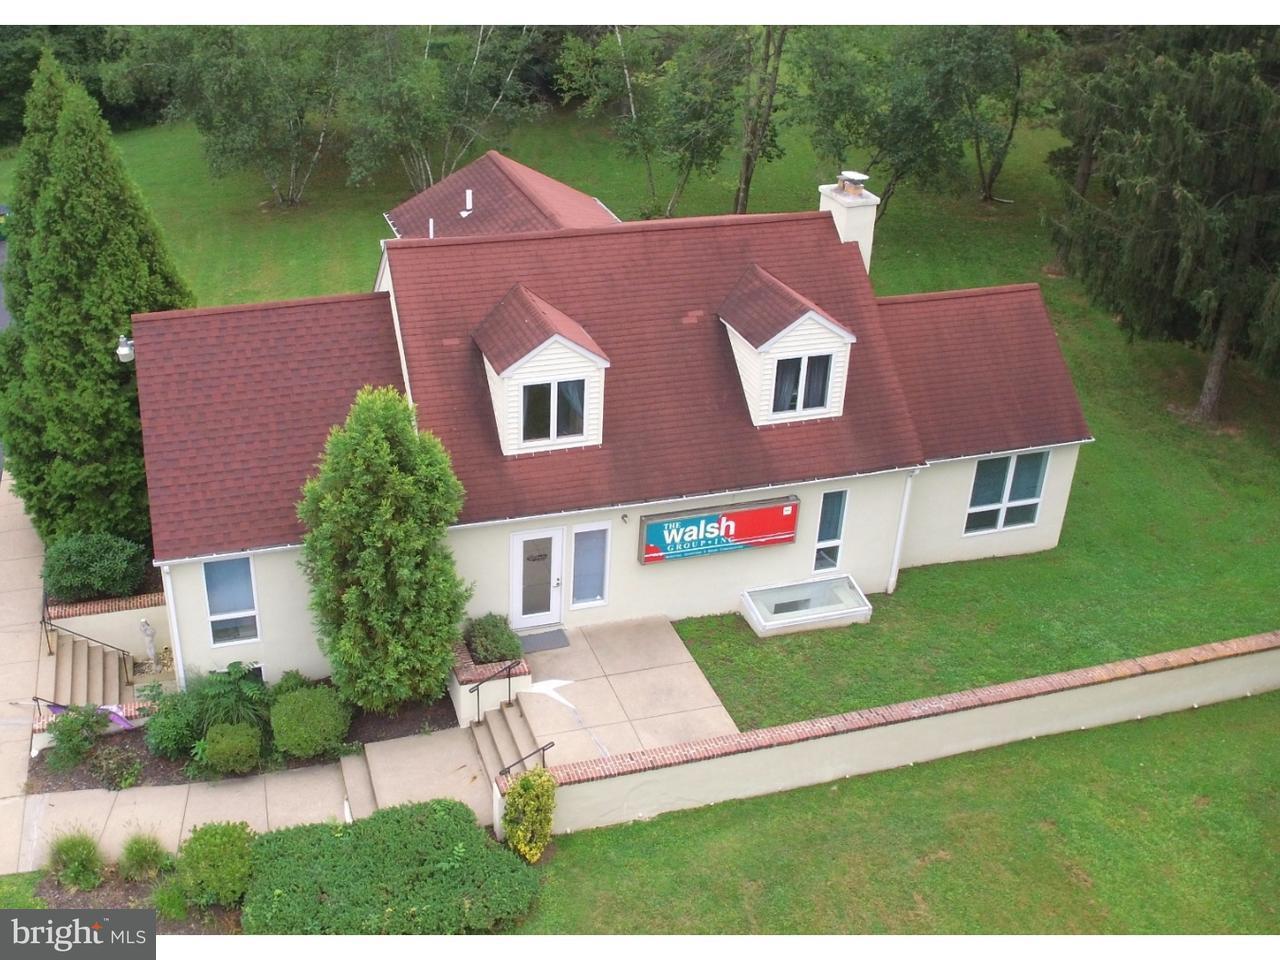 Single Family Home for Sale at 1553 EASTON Road Warrington, Pennsylvania 18976 United States